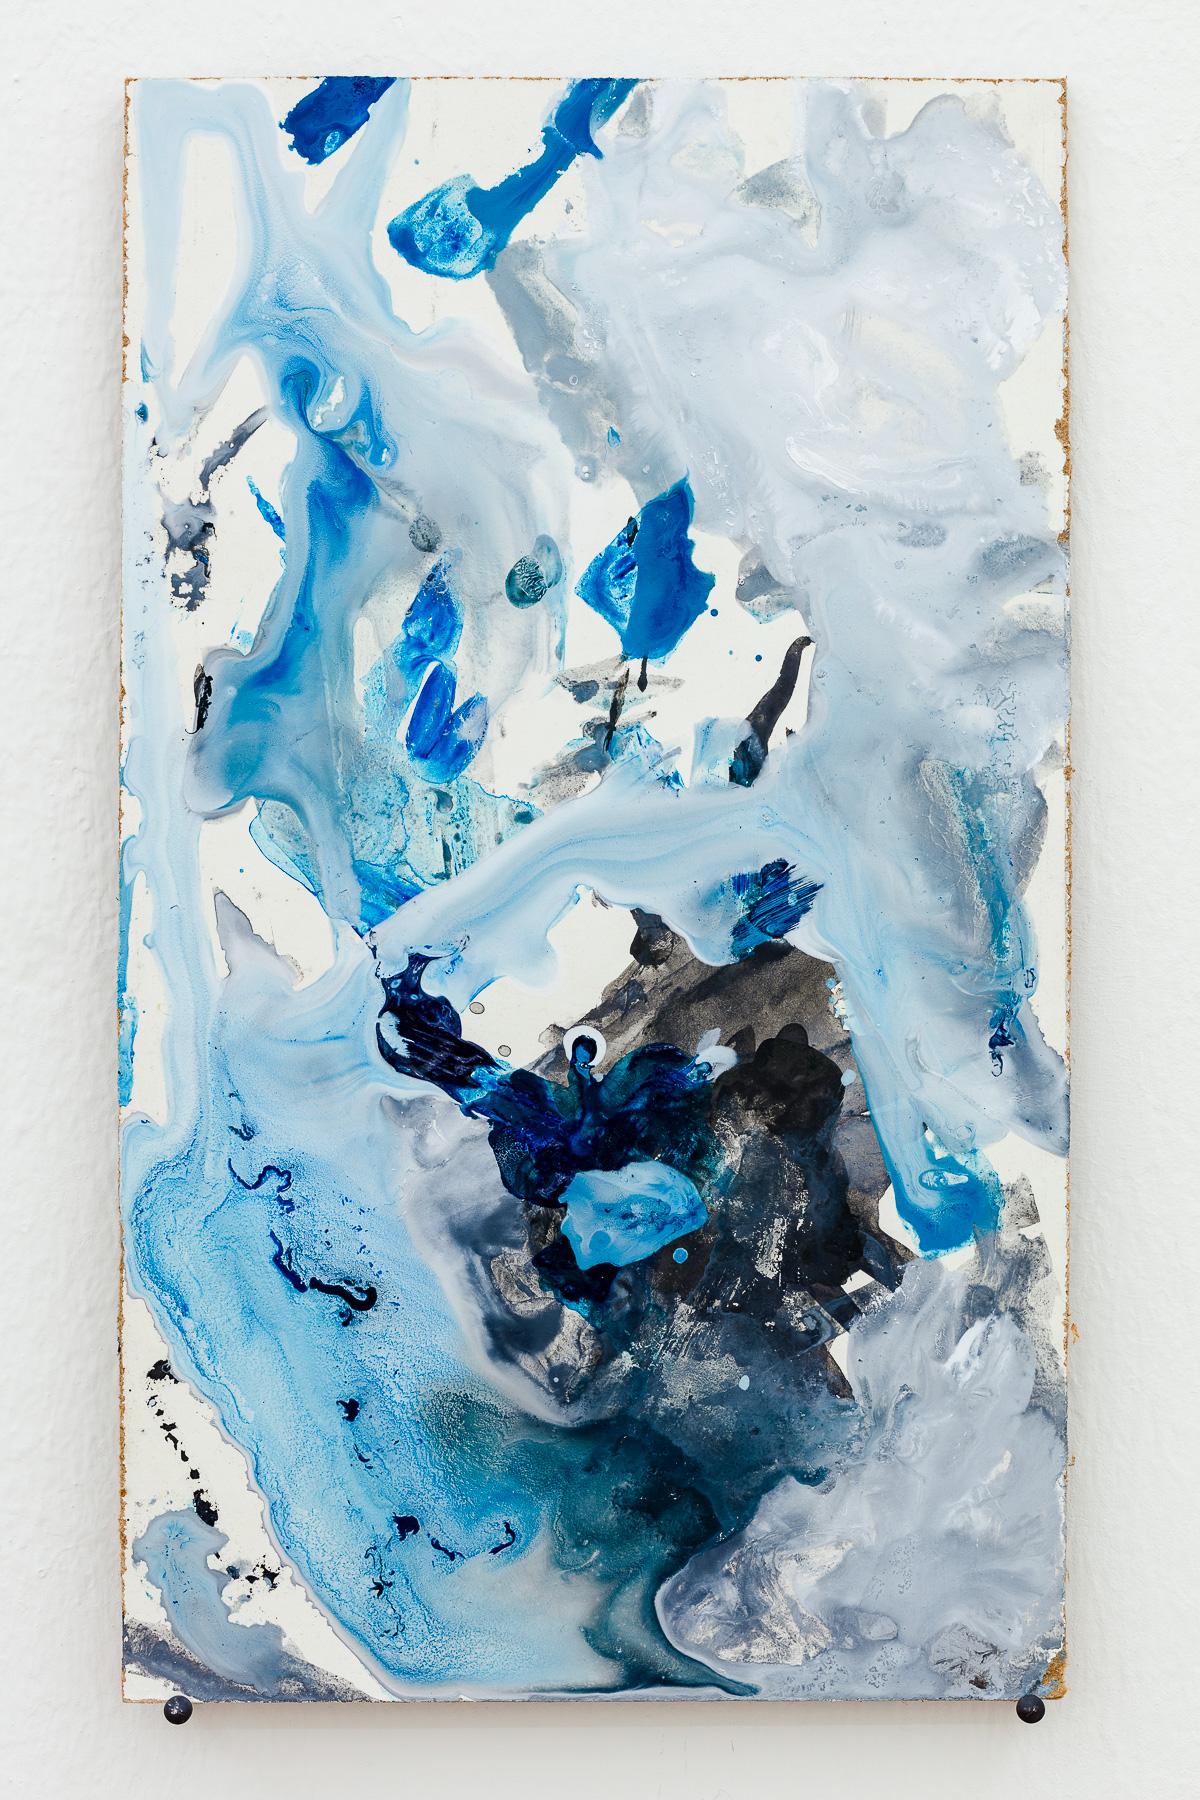 2019_05_20_Elke-Krystufek_Croy-Nielsen_by-kunst-dokumentation-com_015_web.jpg